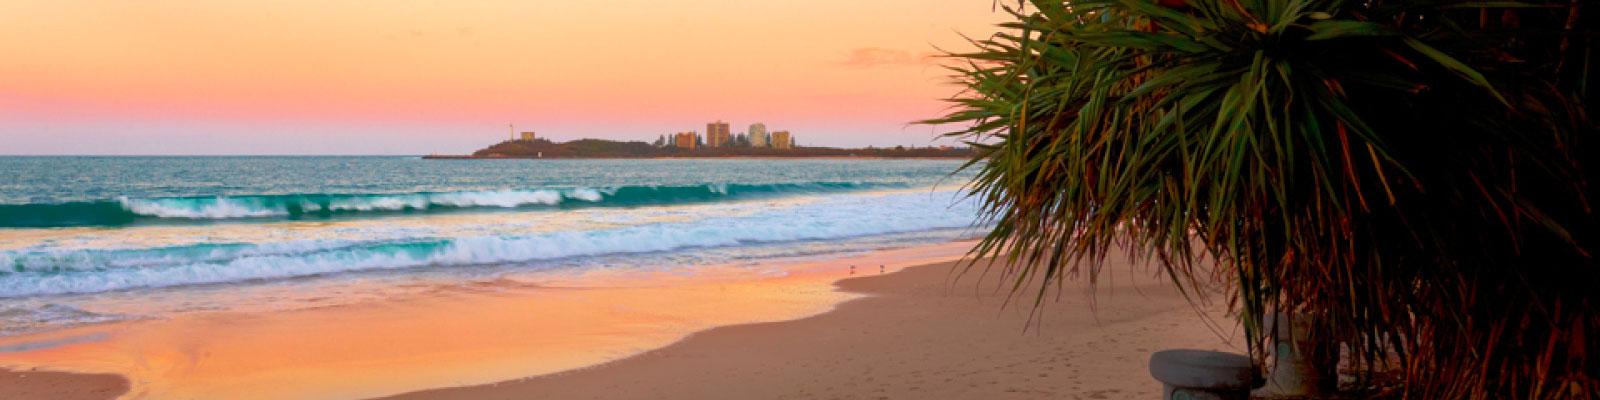 Mooloolaba Beach - Maroochy Surf School